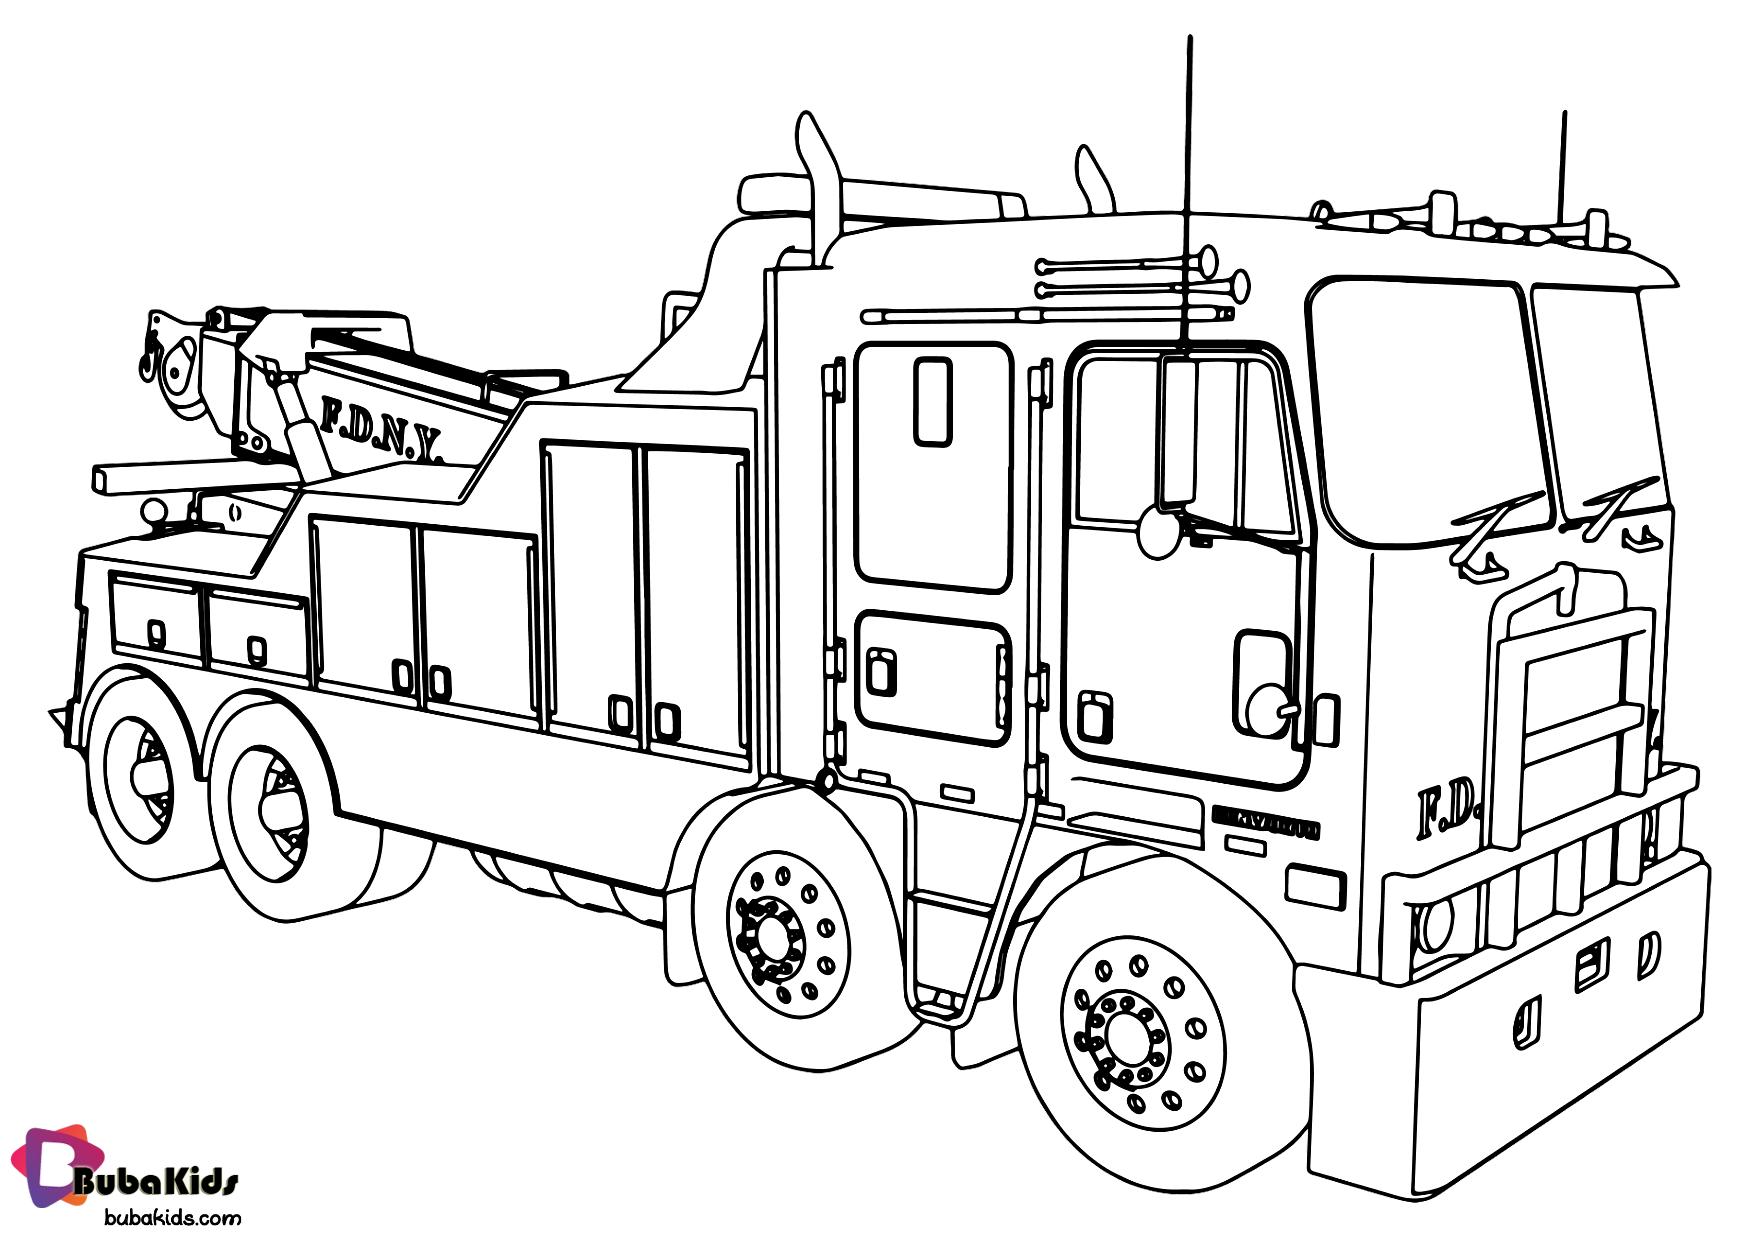 b596c61f0fbacae3fabc2f513f25bb02 » Coloring Pages Fire Trucks